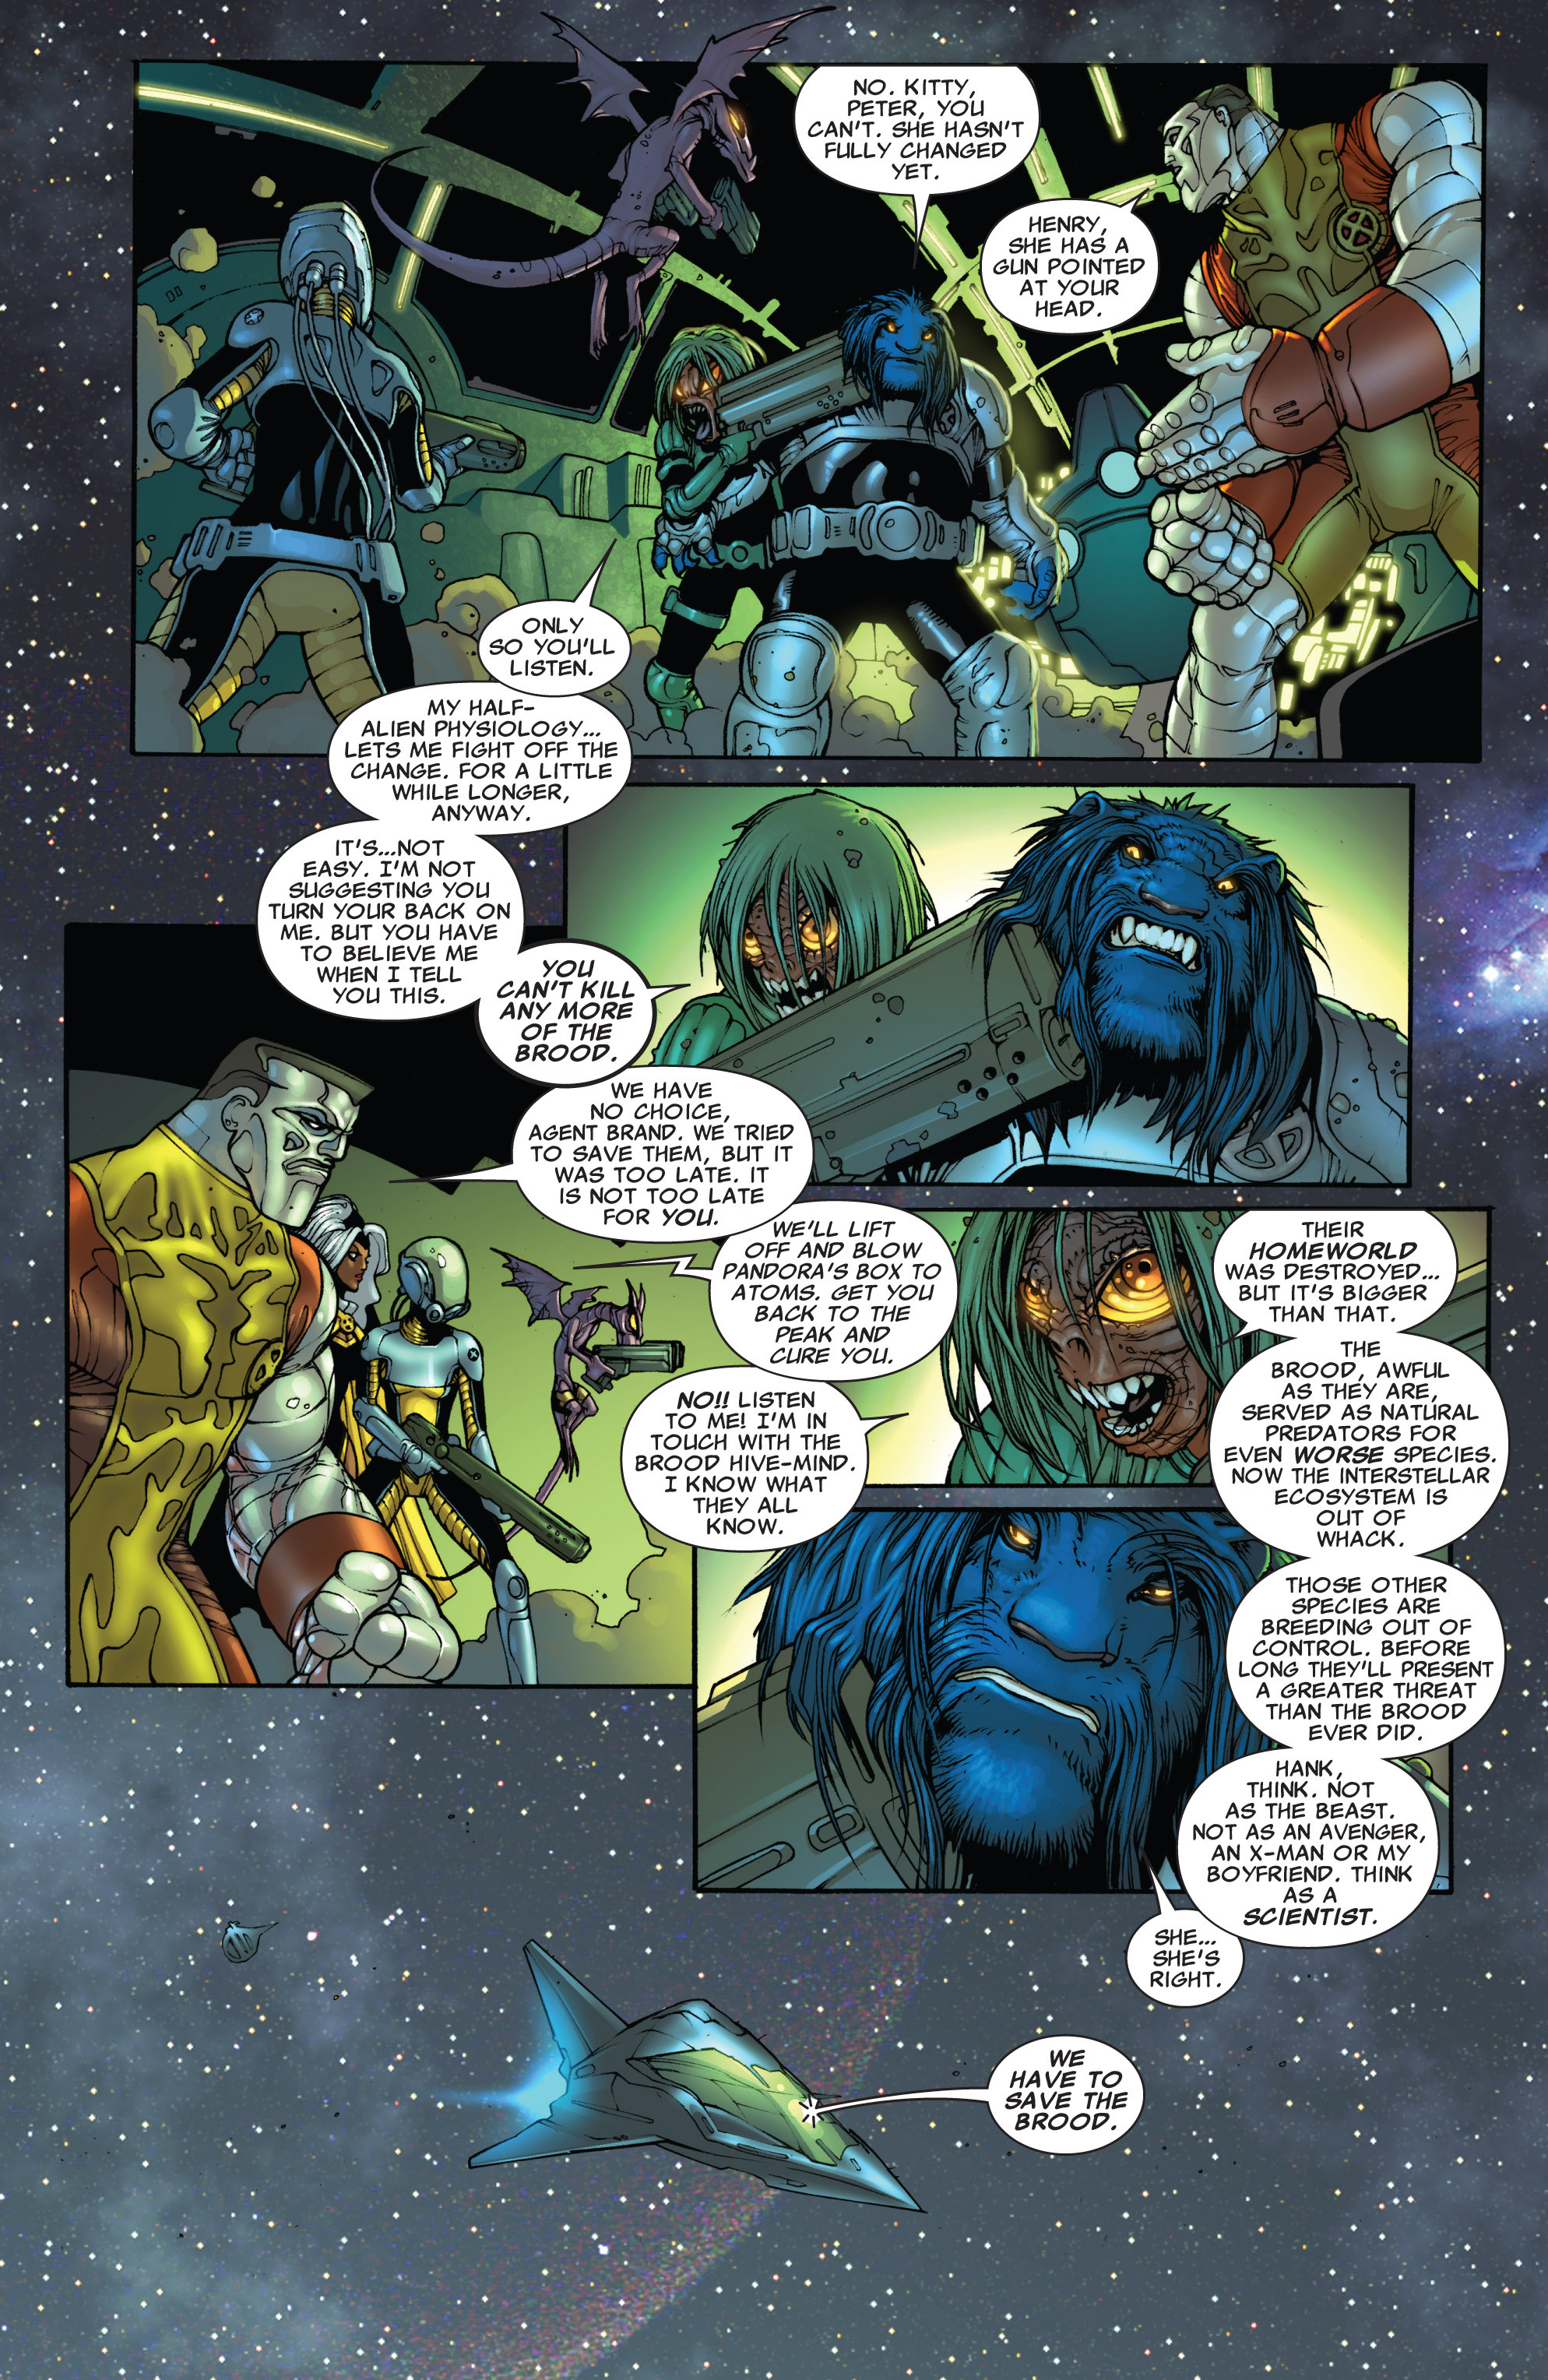 Read online Astonishing X-Men (2004) comic -  Issue #40 - 5